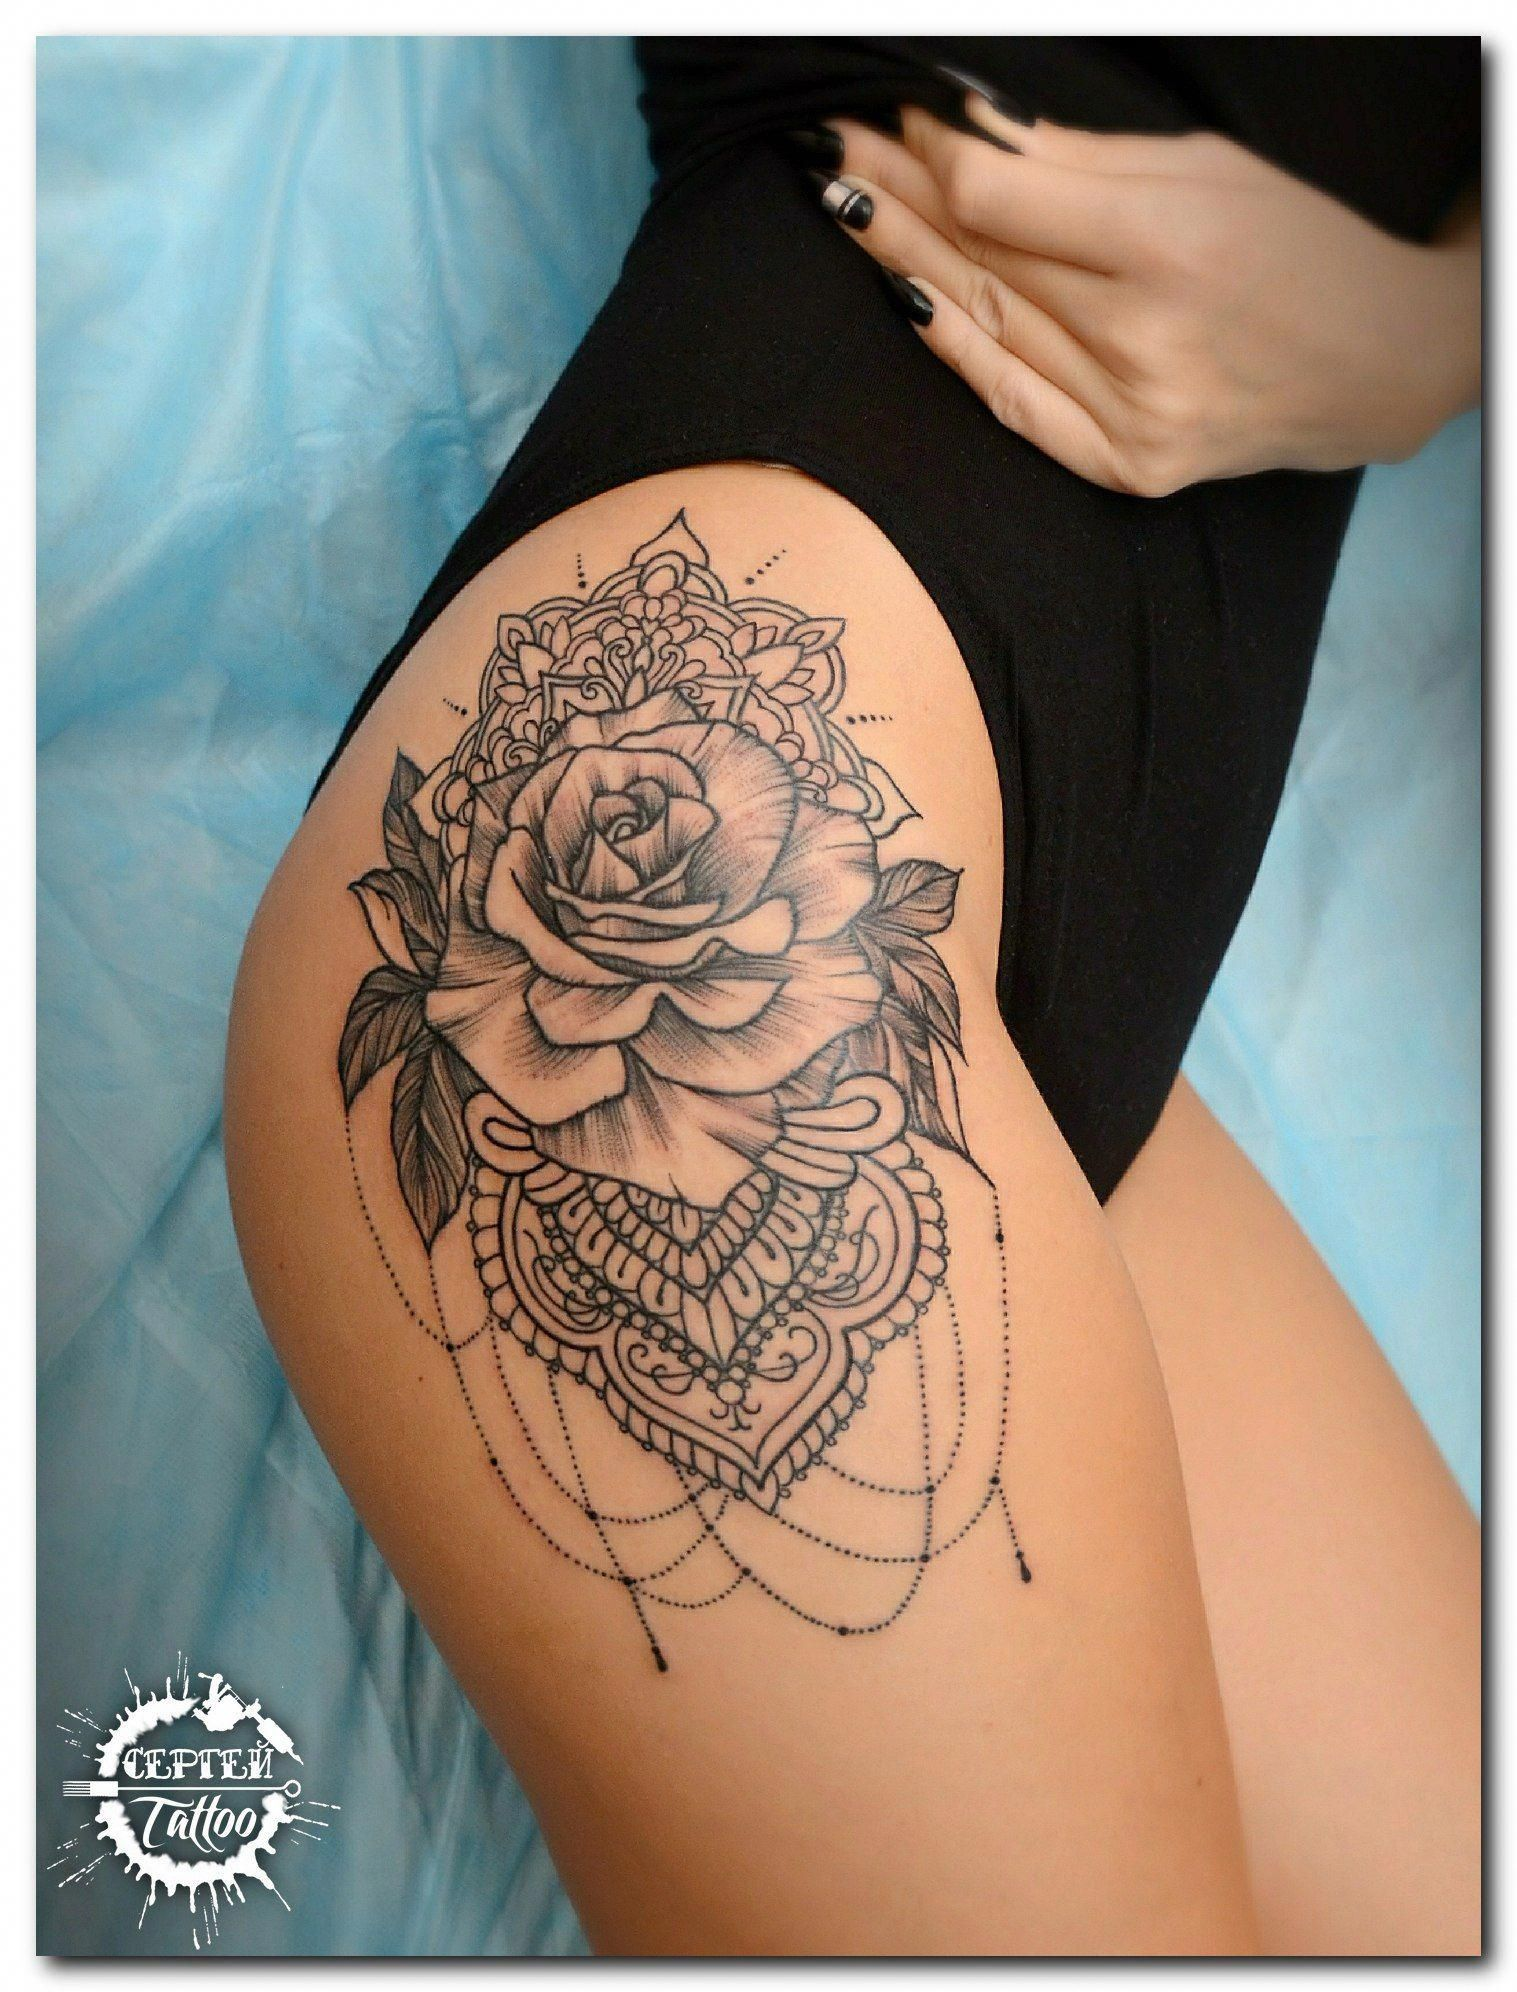 Mandela Tattoo Mandalatattoo Hip Thigh Tattoos Hip Tattoos Women Hip Tattoo Designs